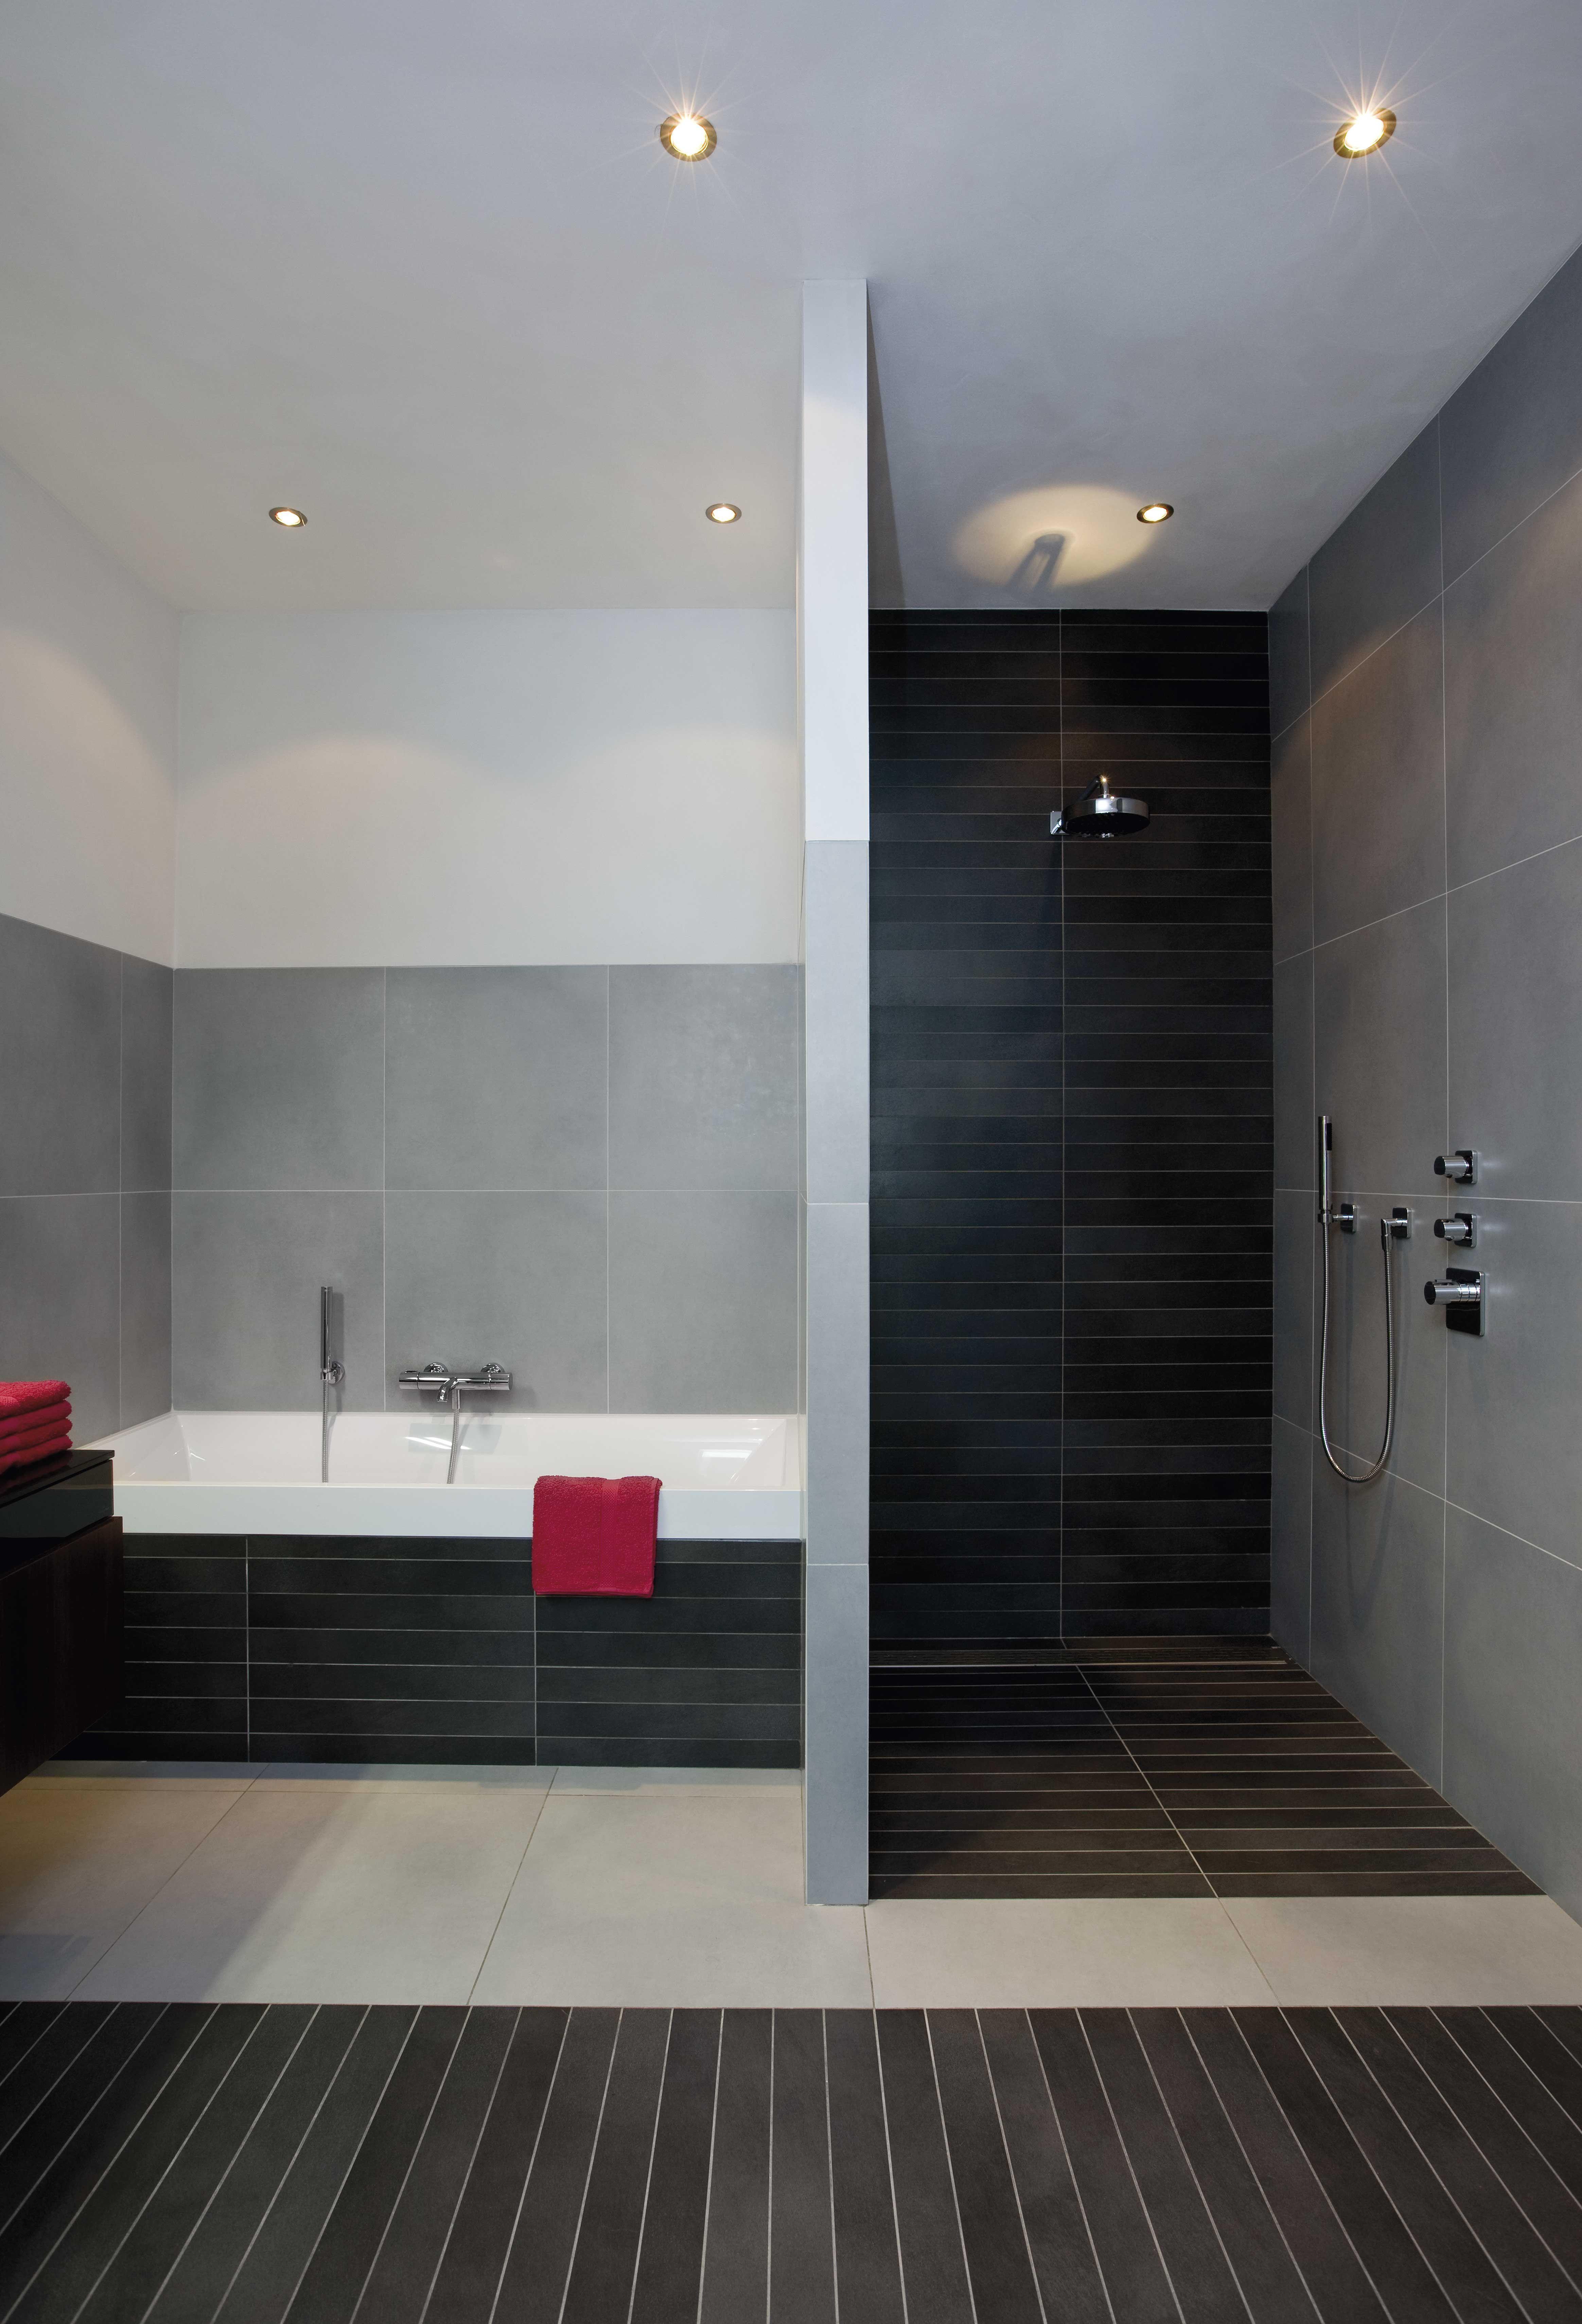 13+ Dazzling Minimalist Decor Ceilings Ideas